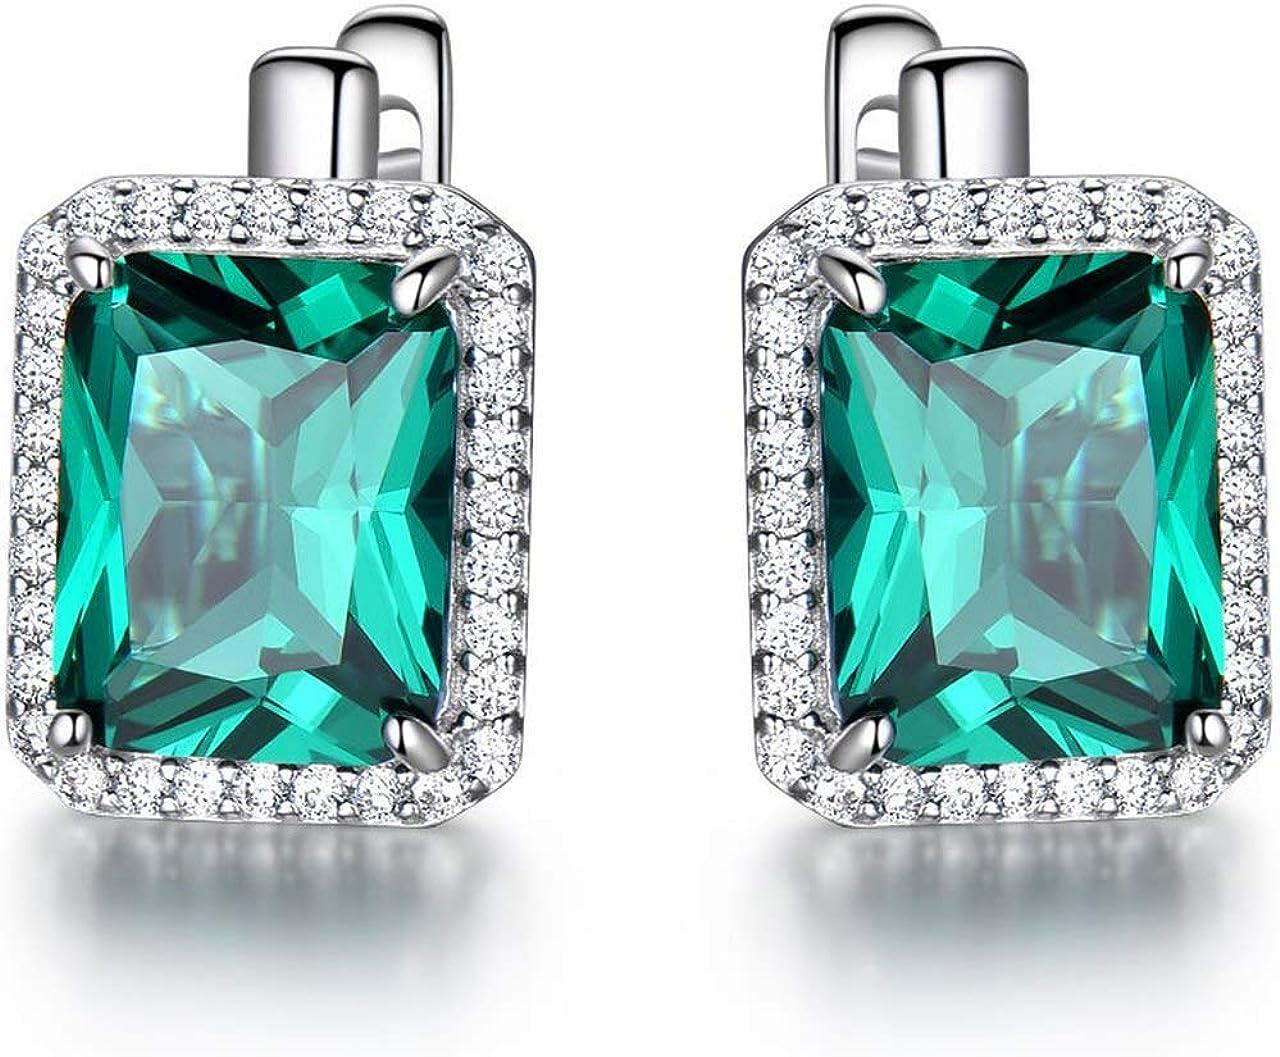 Cushion Cut Green Emerald 5 ☆ popular Gemstone Clip Earrings for Women Ar on Ranking TOP20